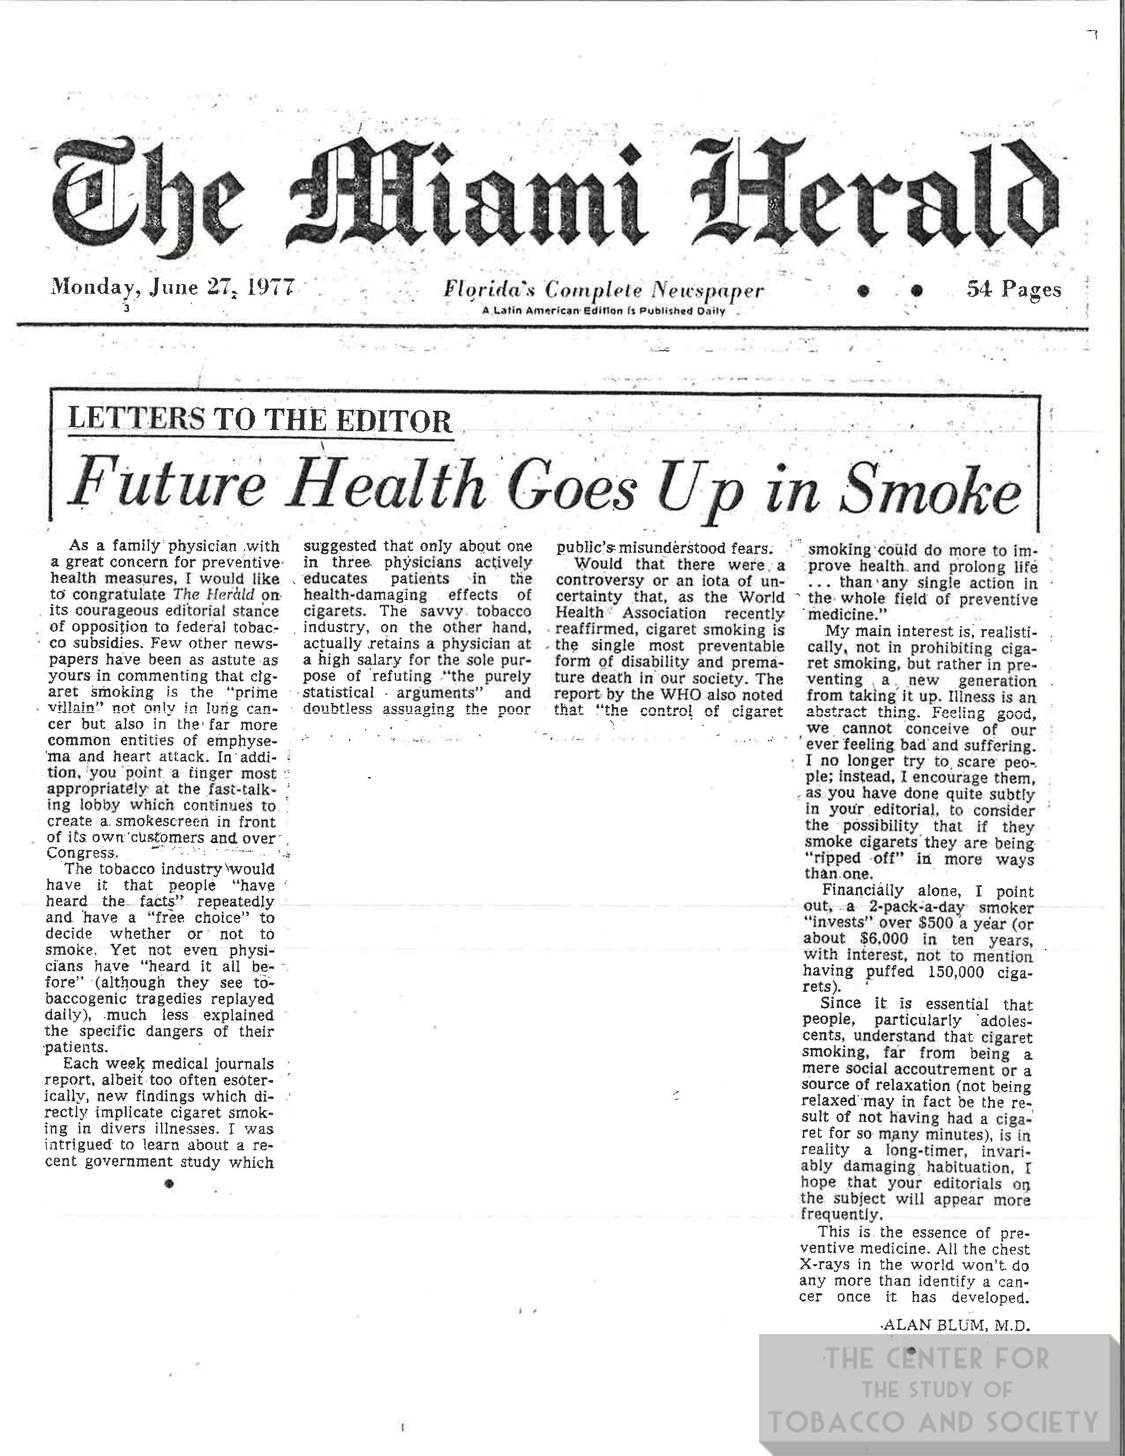 1977 06 27 Miami Herald Future Health Goes Up in Smoke